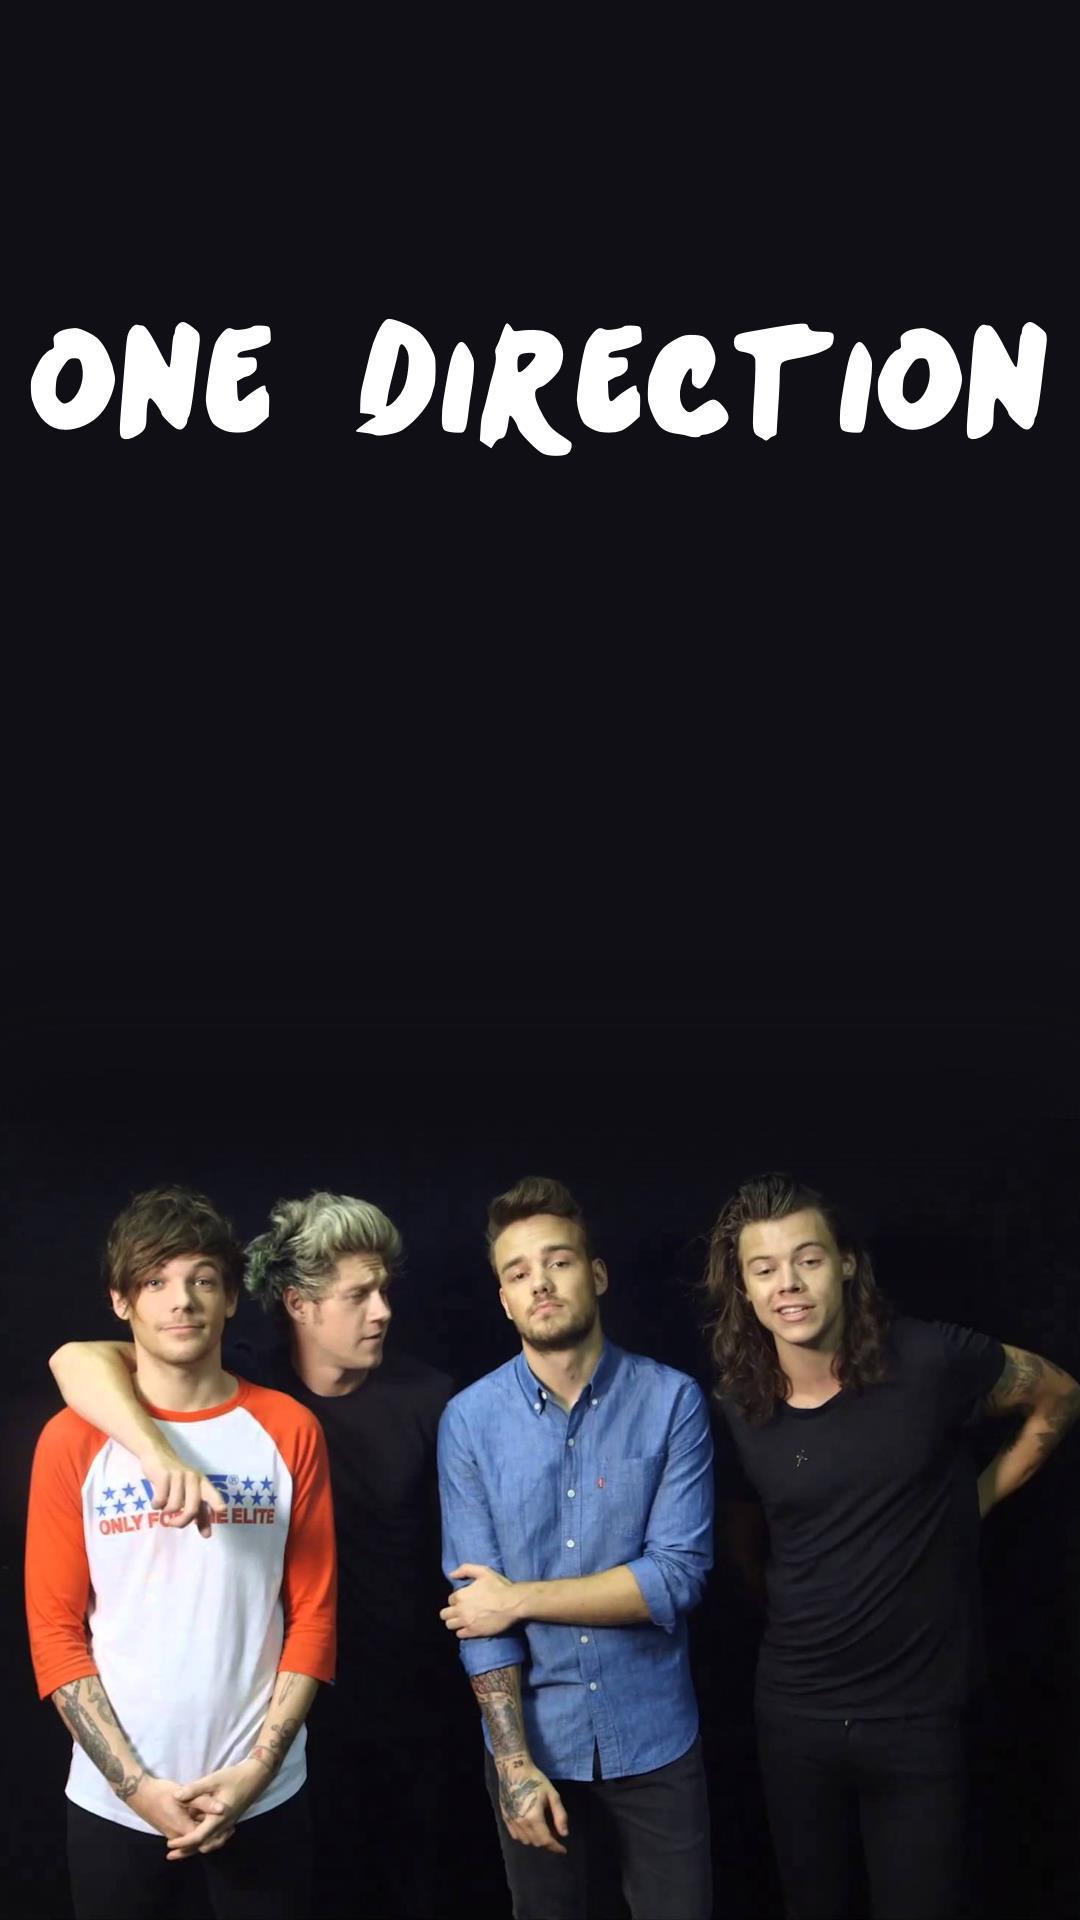 One Direction Iphone Wallpaper Supportive Guru